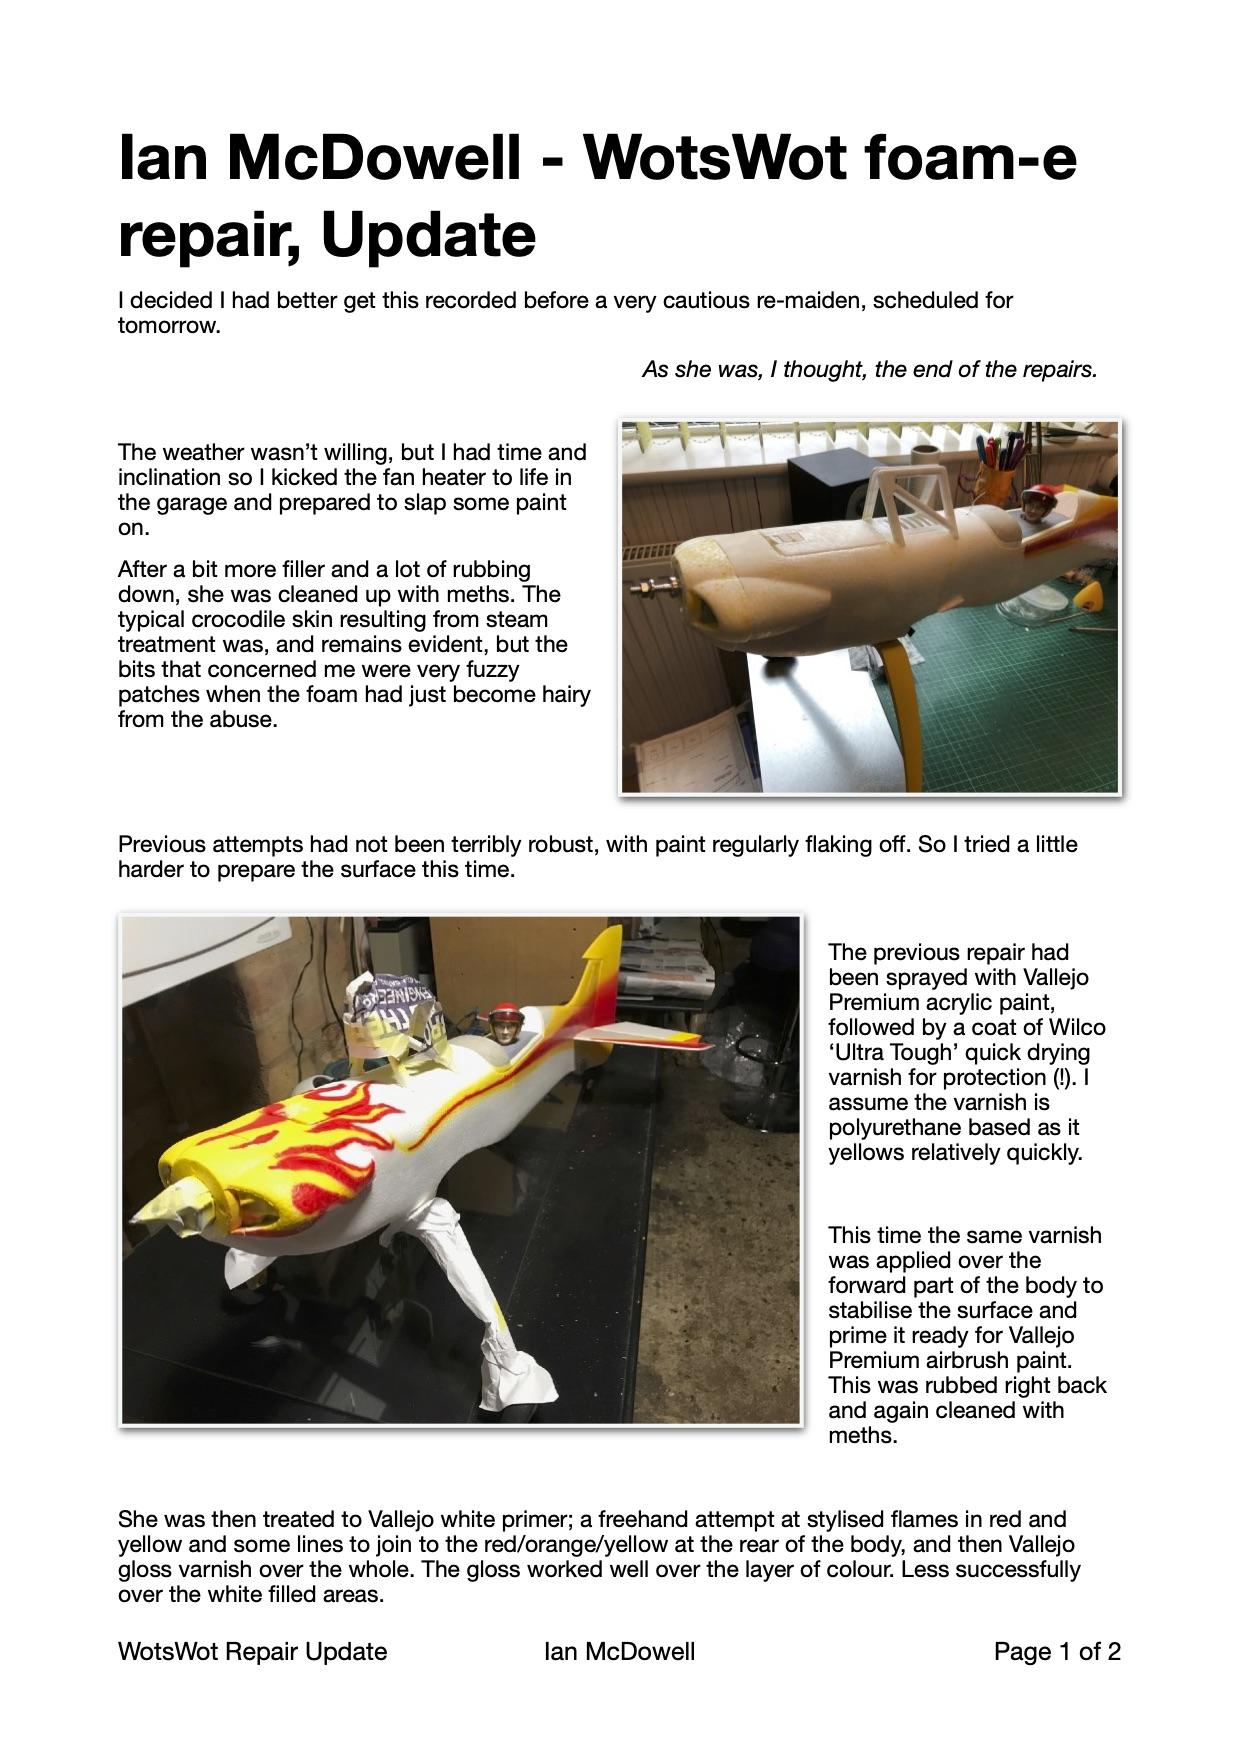 Ian McDowell - WotsWot foam-e repair, update